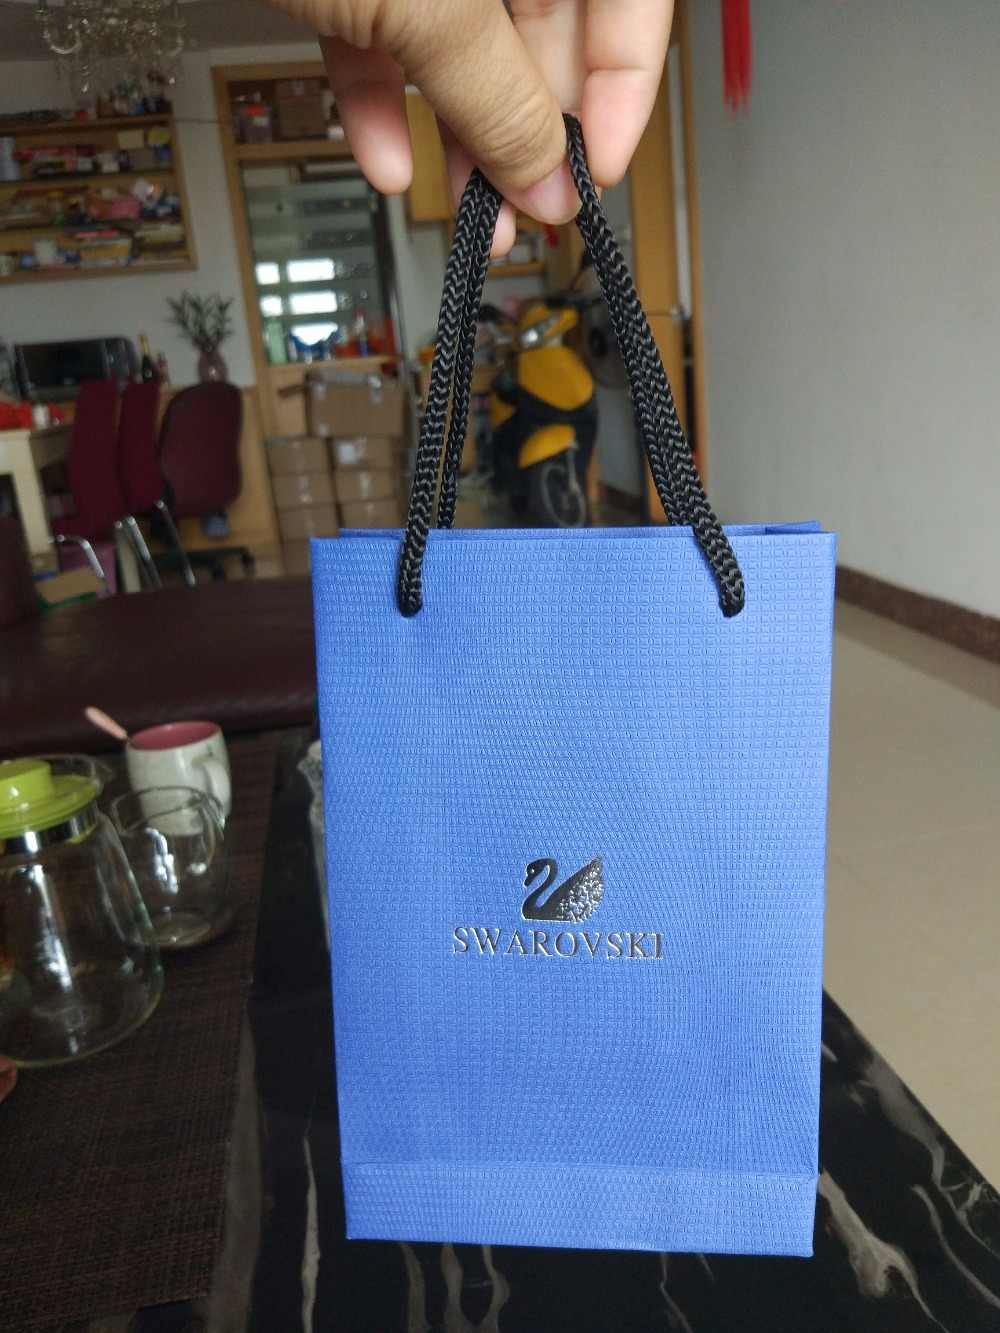 731c9dfa40 ... New Diamond on top Swarovski crystal pen box gift bag velvet pouch ...